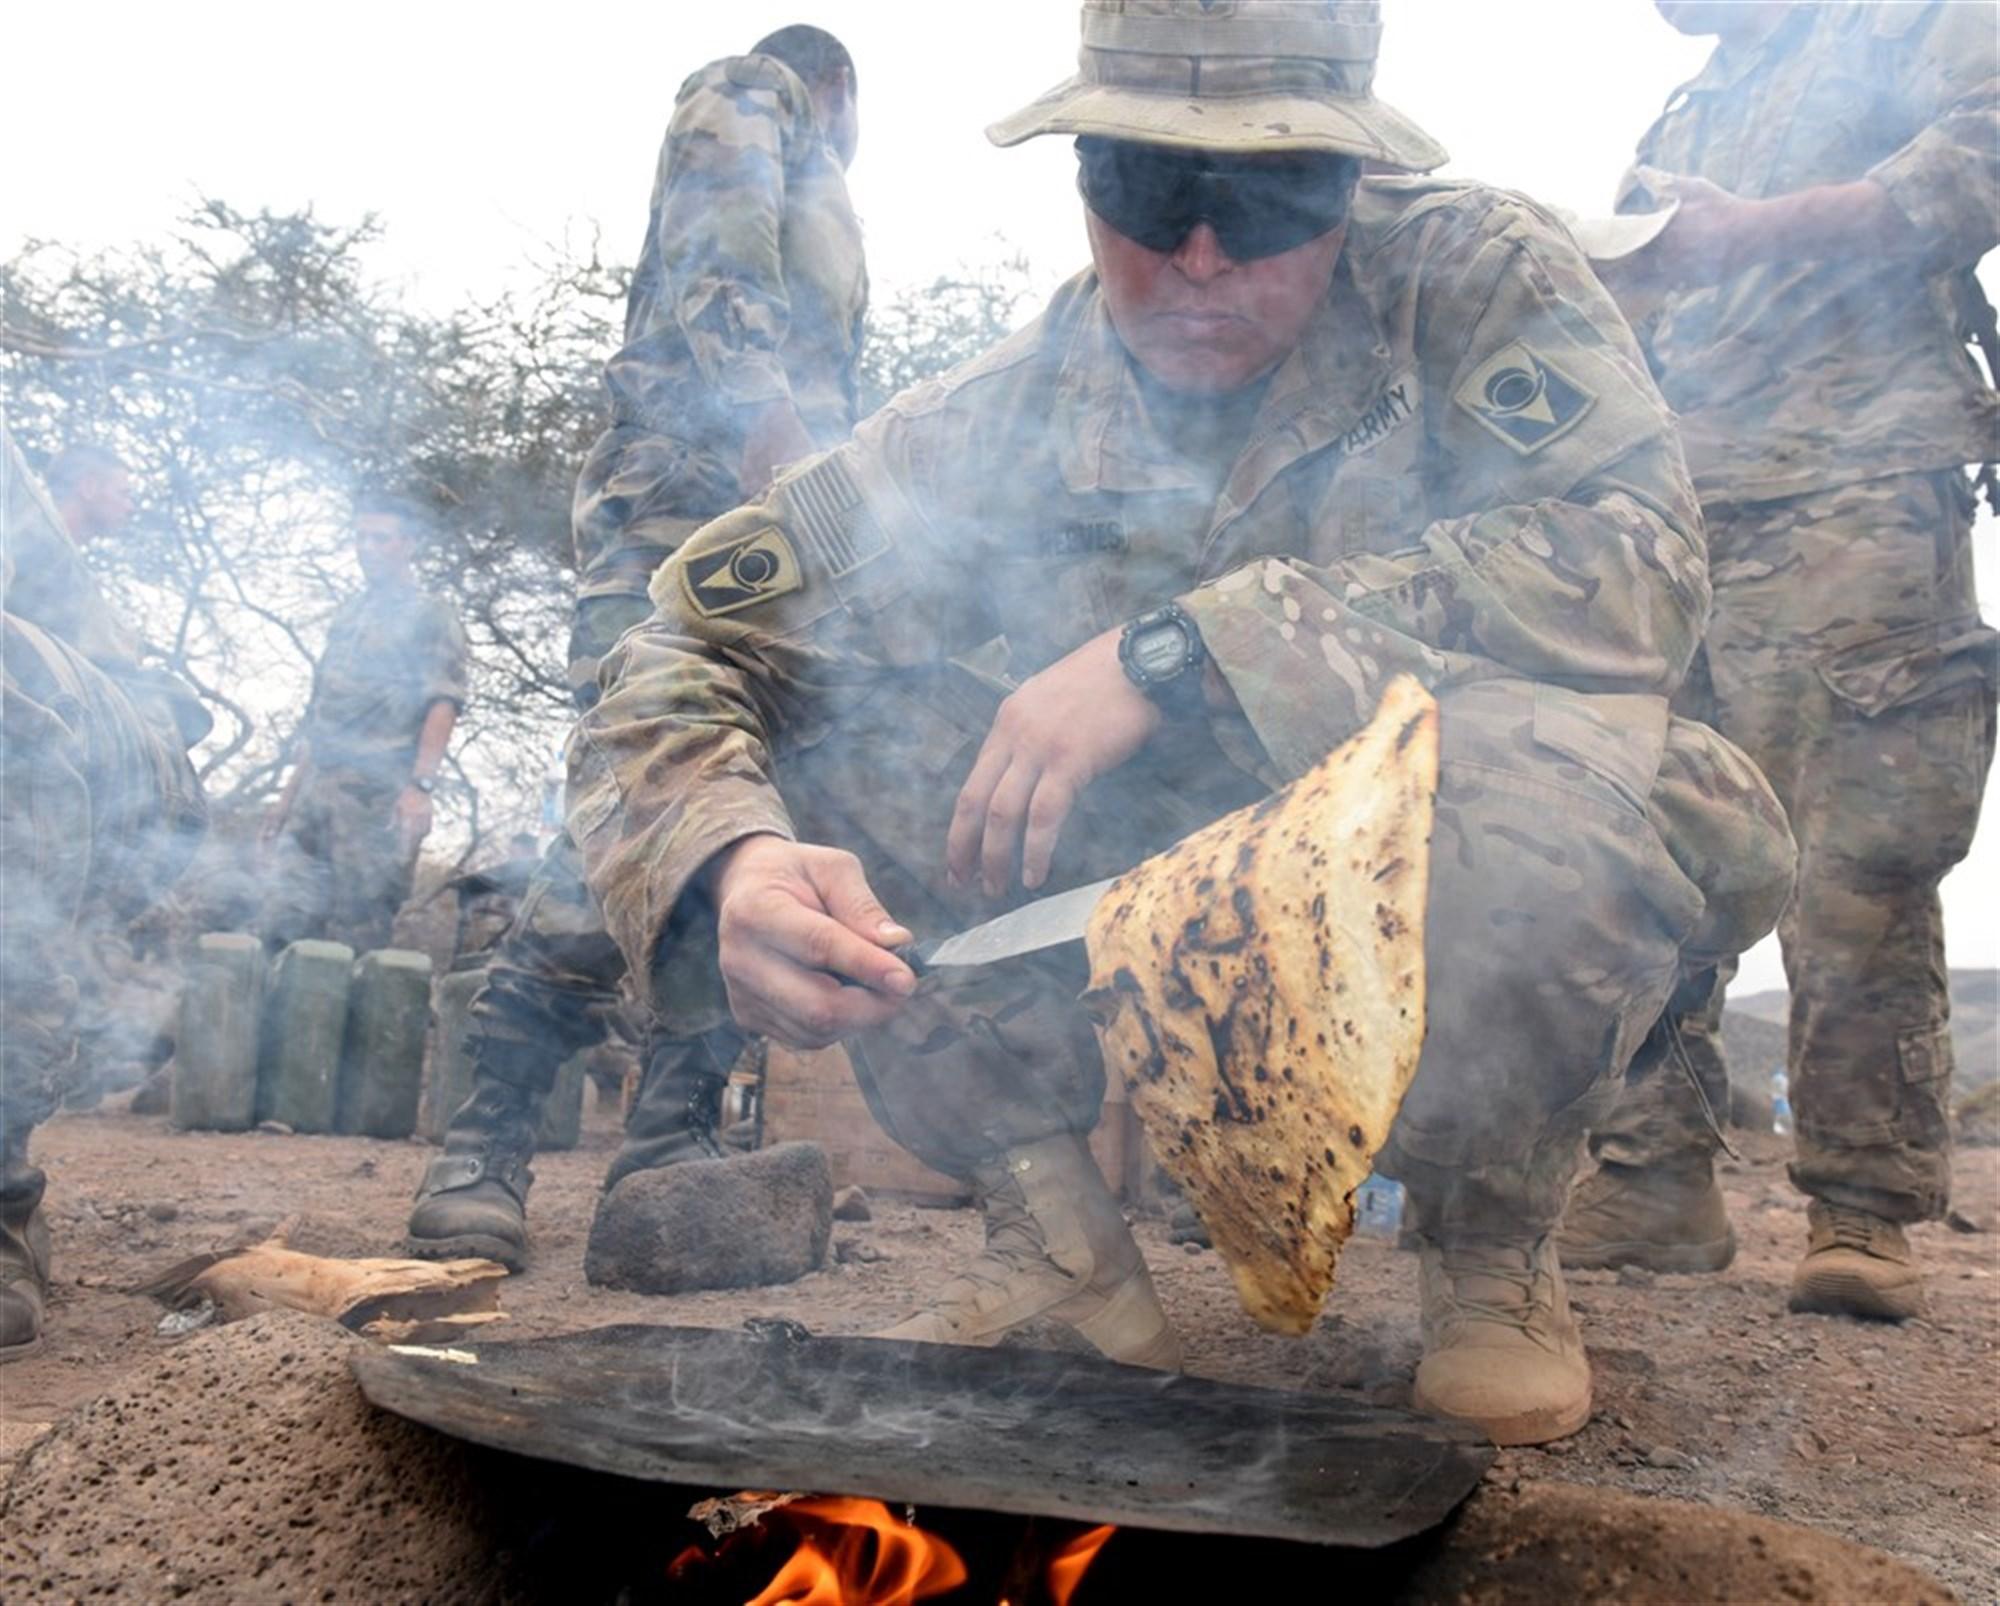 U.S. Army Spc. Christopher Reeves, 2-124 Infantry Battalion mechanic,  grills flatbread